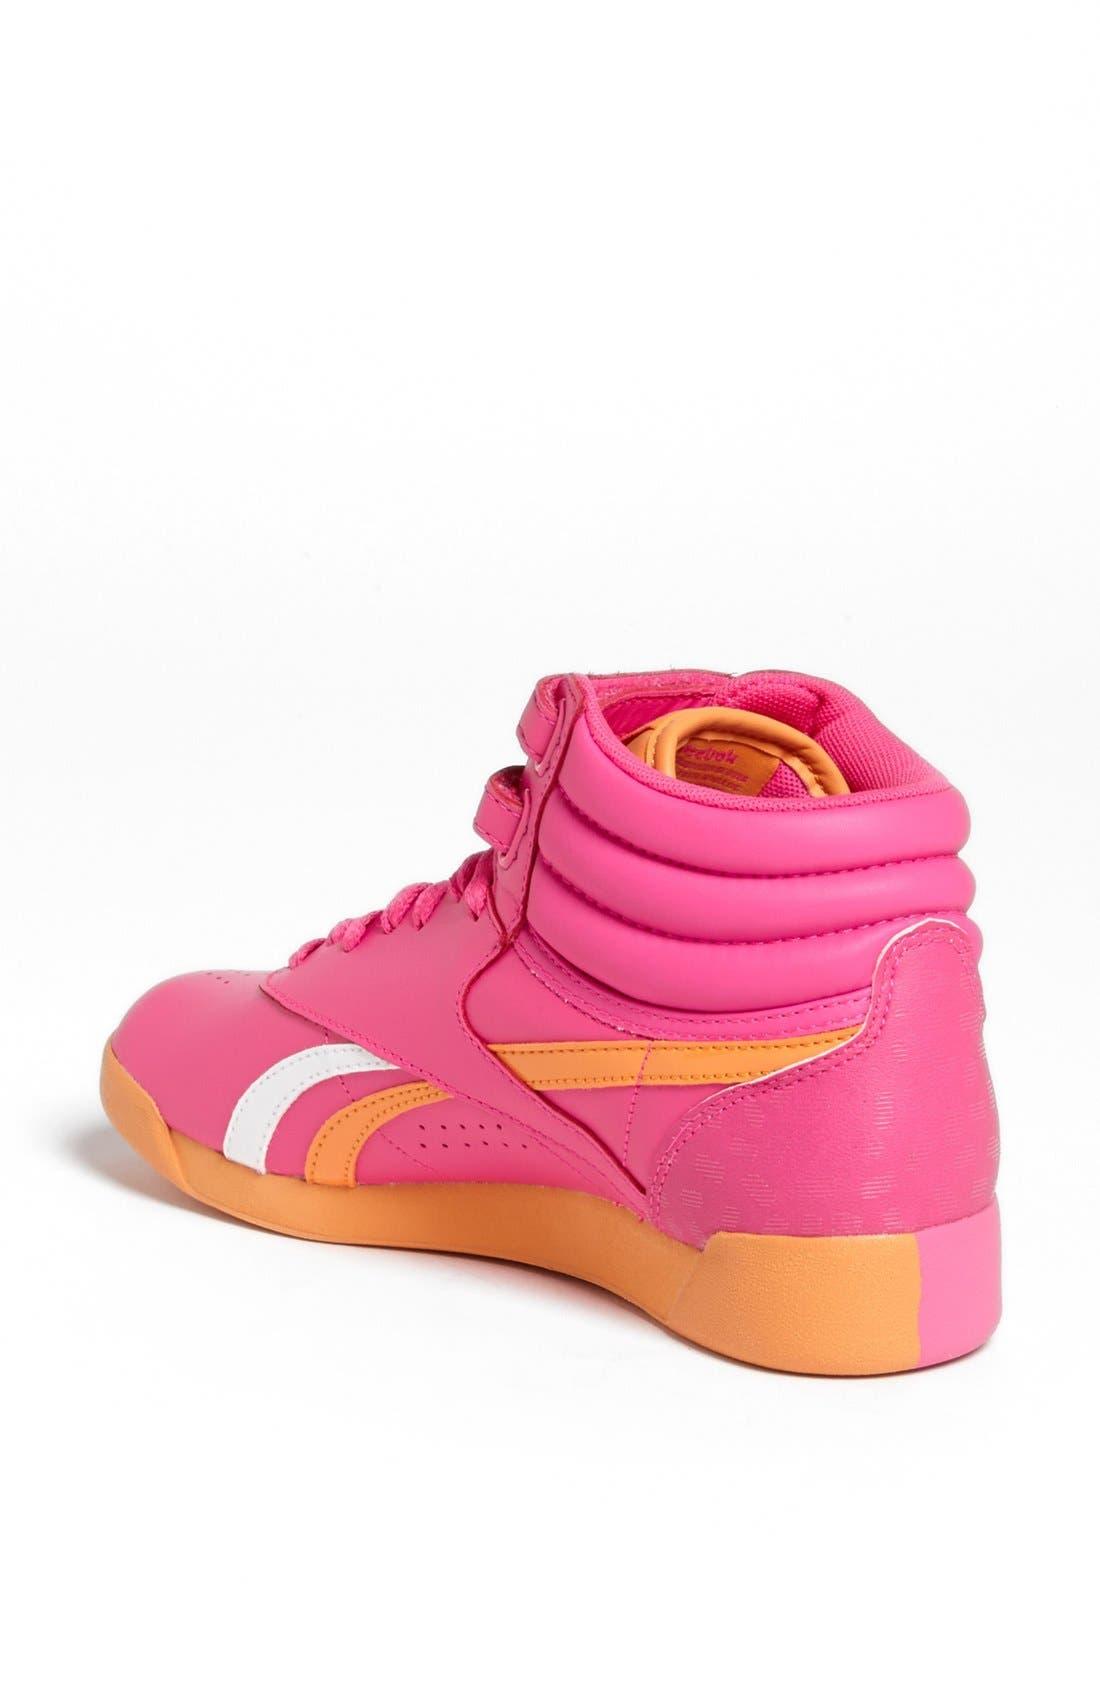 Alternate Image 2  - Reebok 'F/S Hi Splitz' High Top Sneaker (Women)